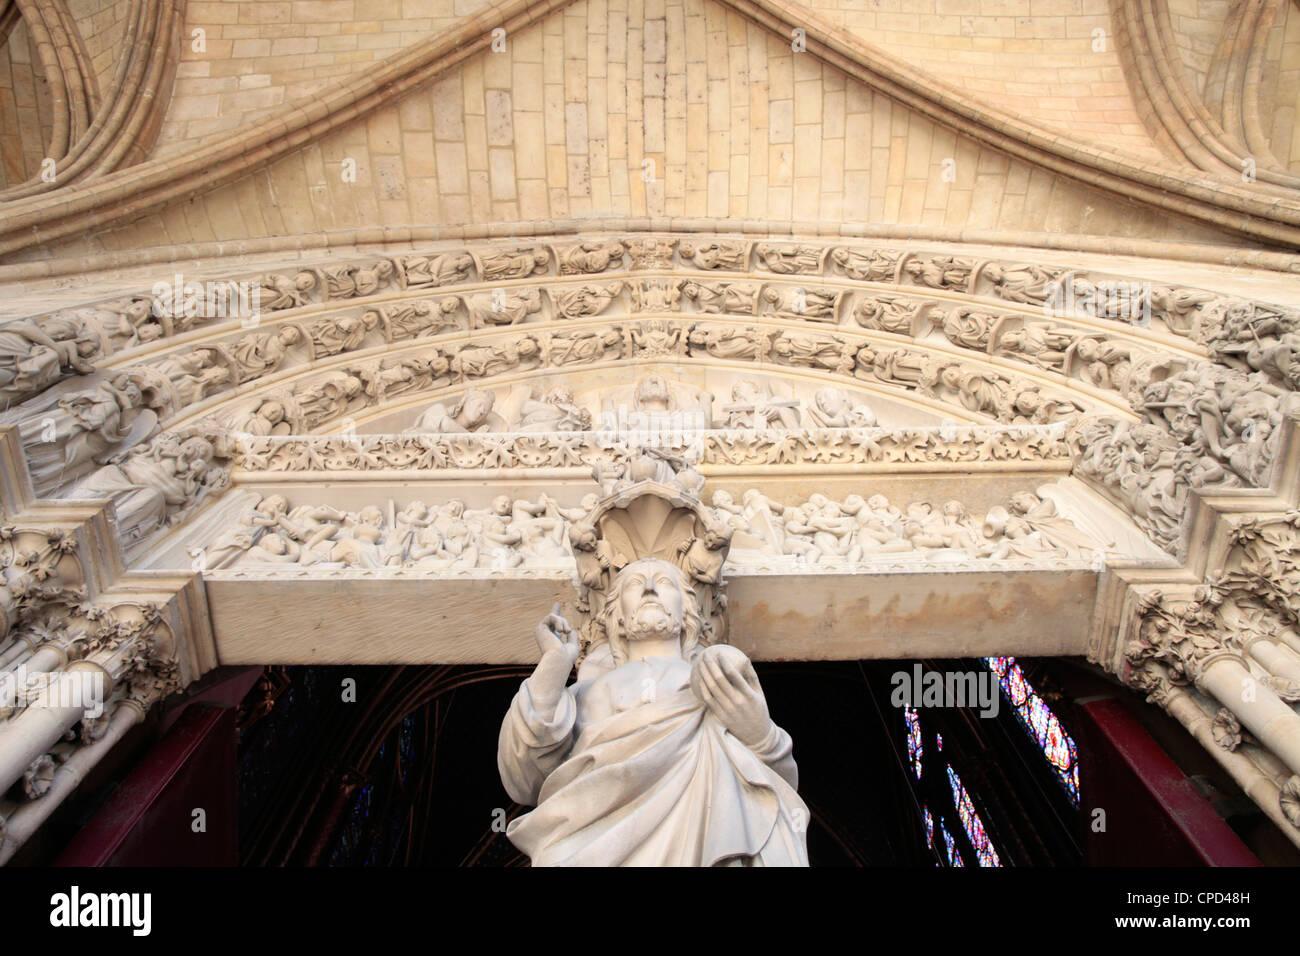 Jesus, Eingangsportal der oberen Kapelle Sainte-Chapelle, Paris, Frankreich Stockbild